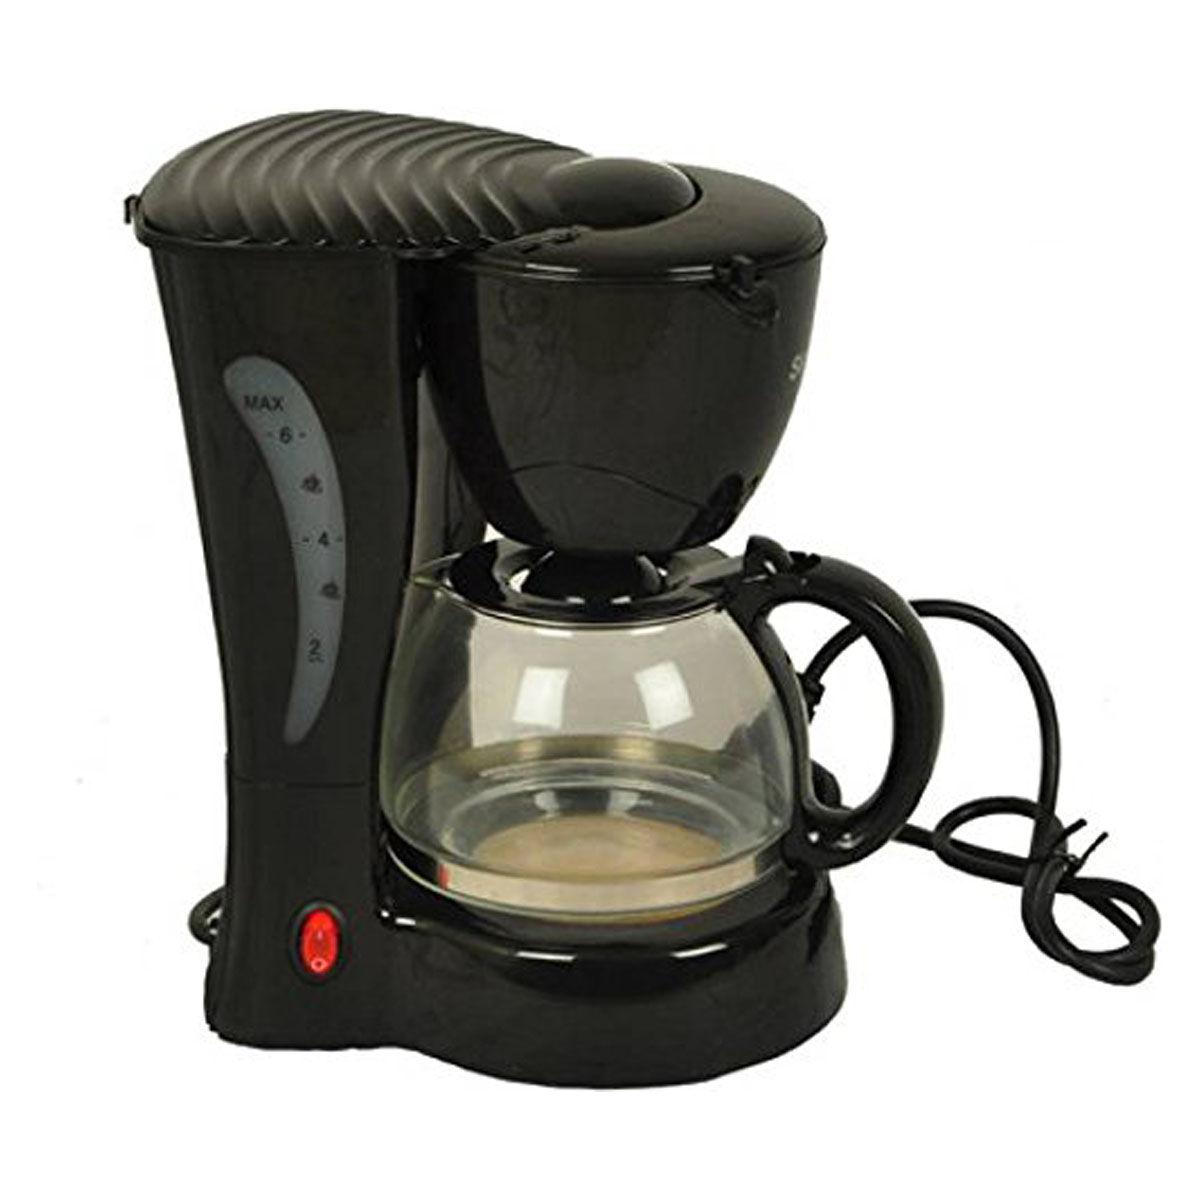 Skyline VTL-7014 6 cups Coffee Maker